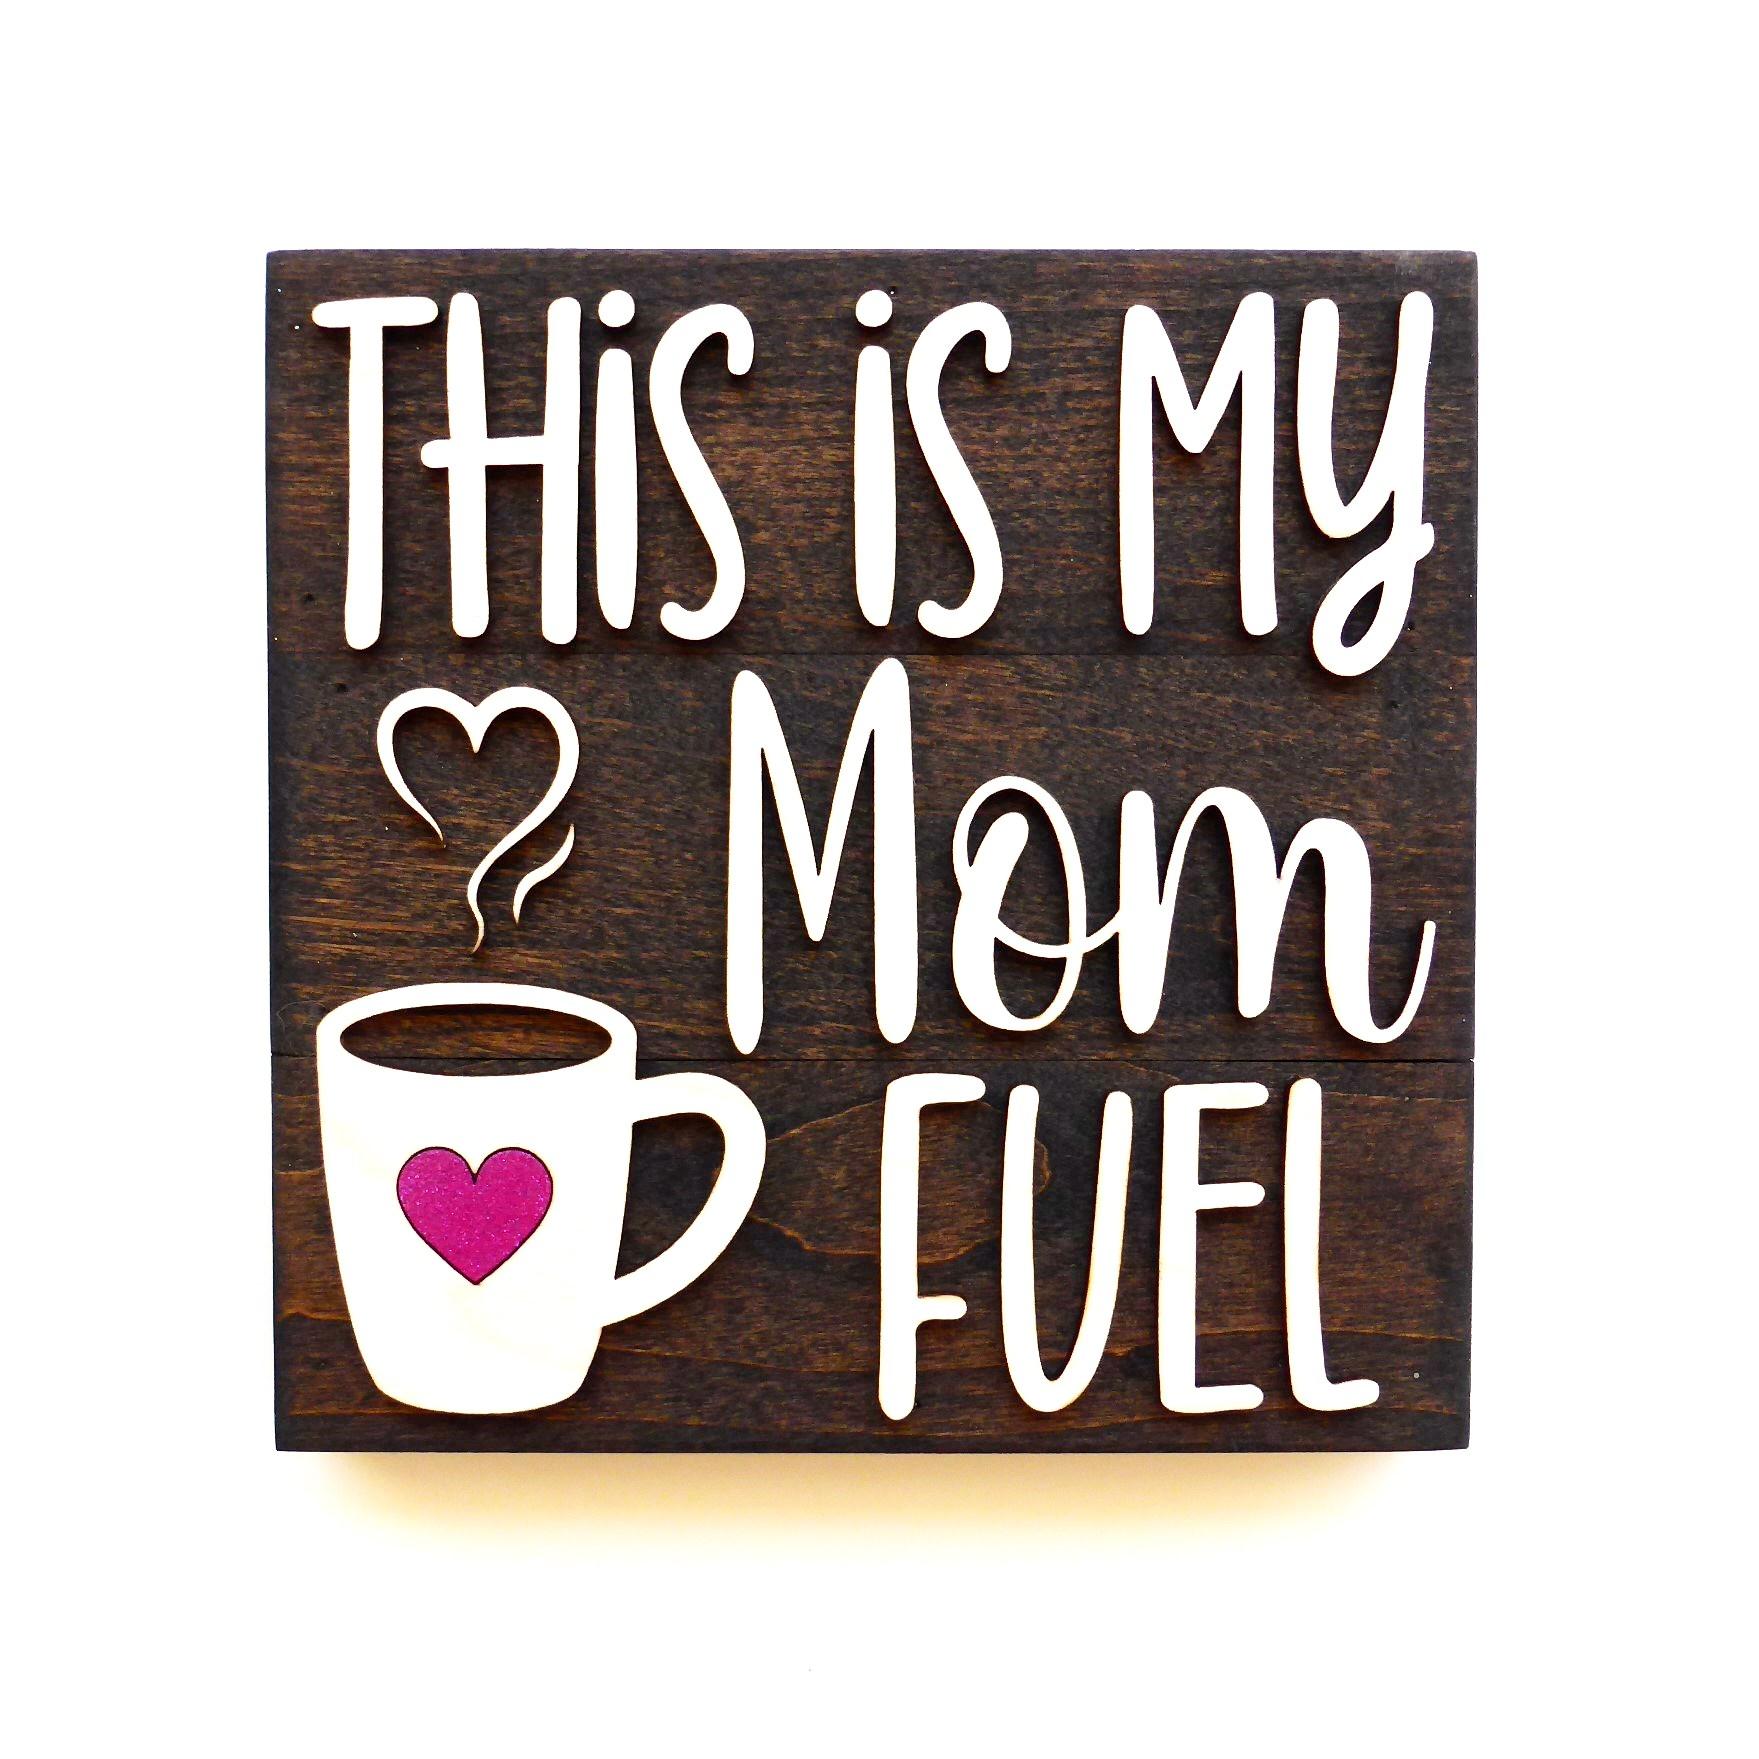 coffeemomfuel